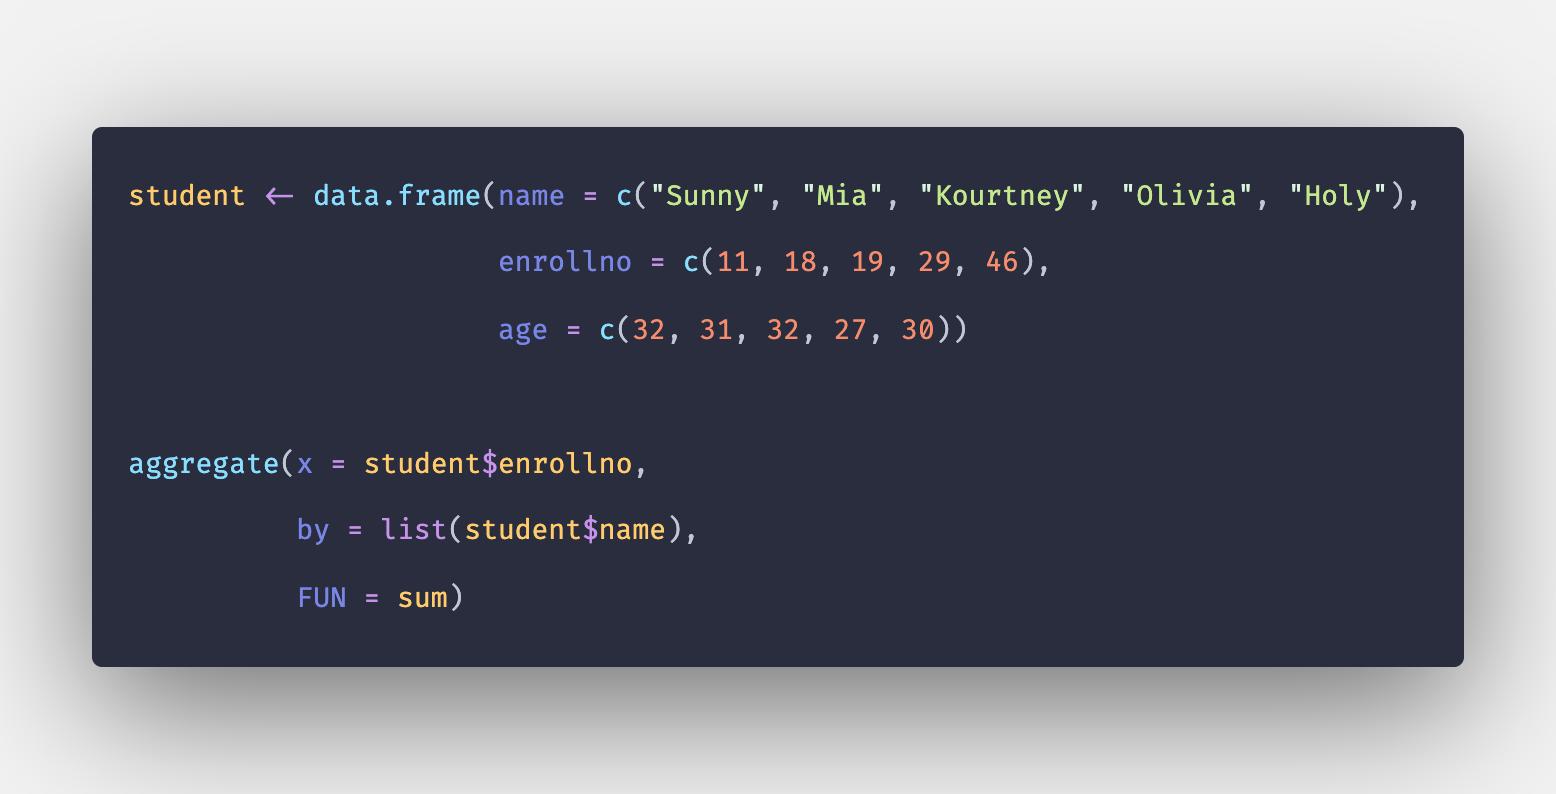 Sum in R - How to Find Sum of Vectors in R